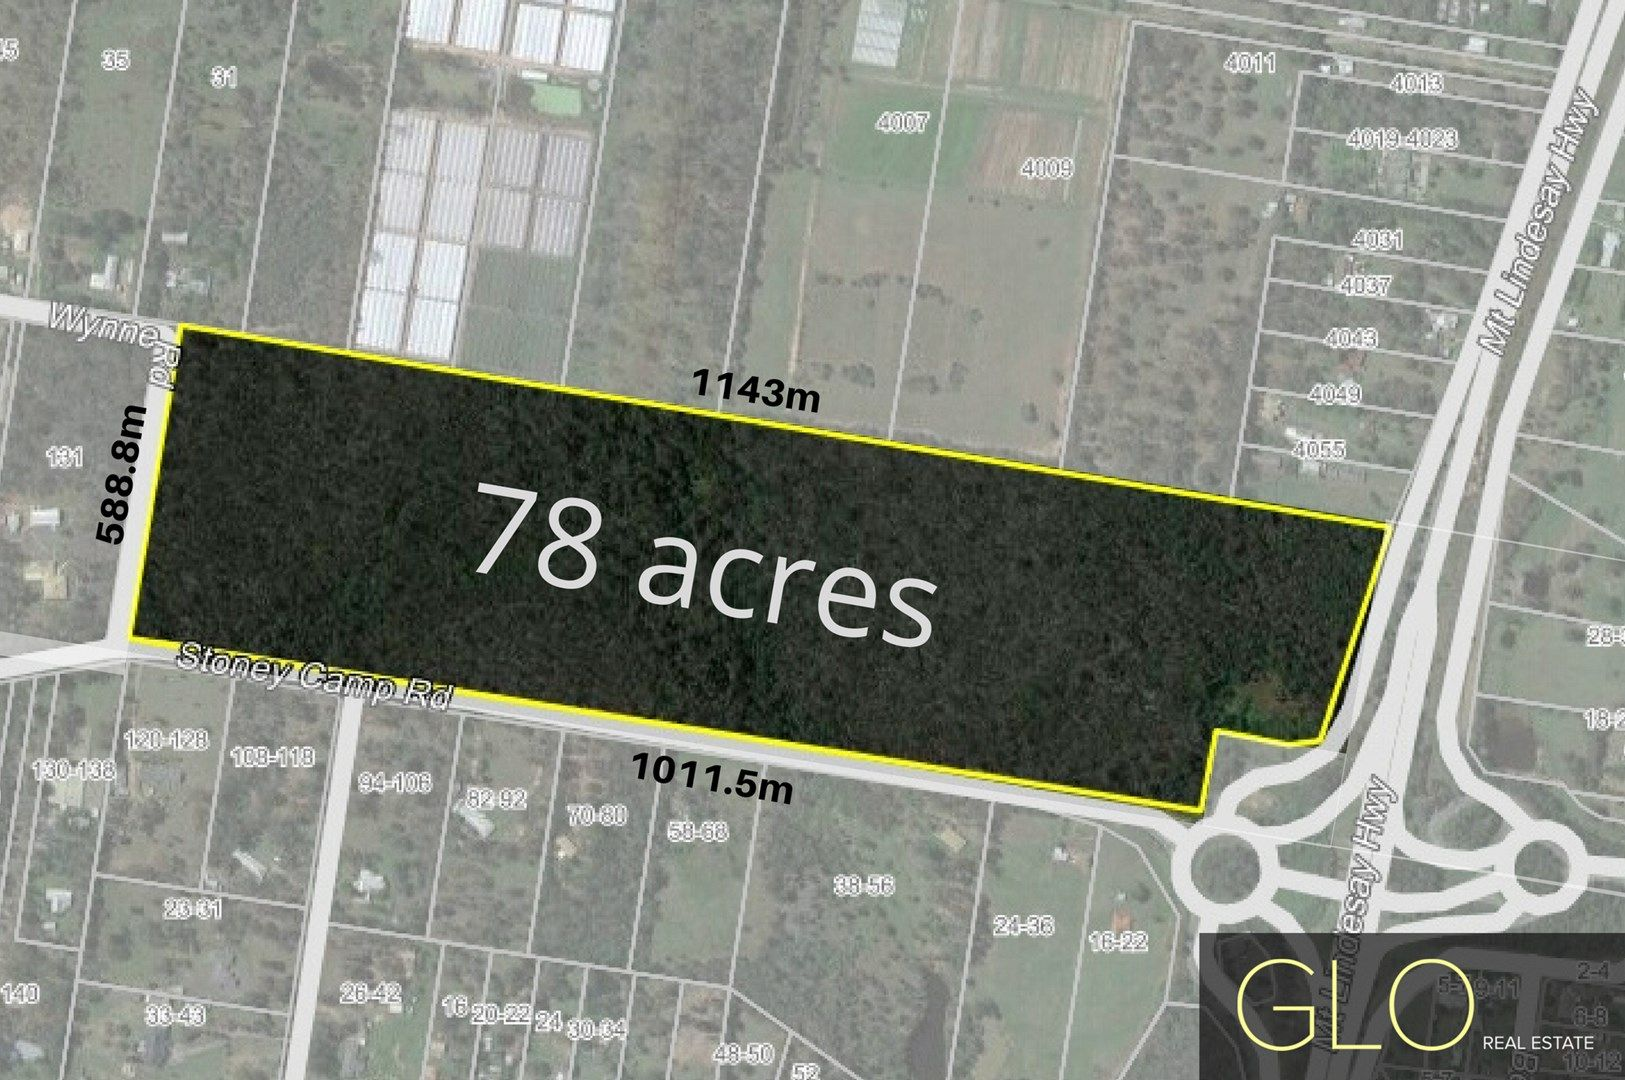 4061 Mount Lindesay Highway, Greenbank QLD 4124, Image 0